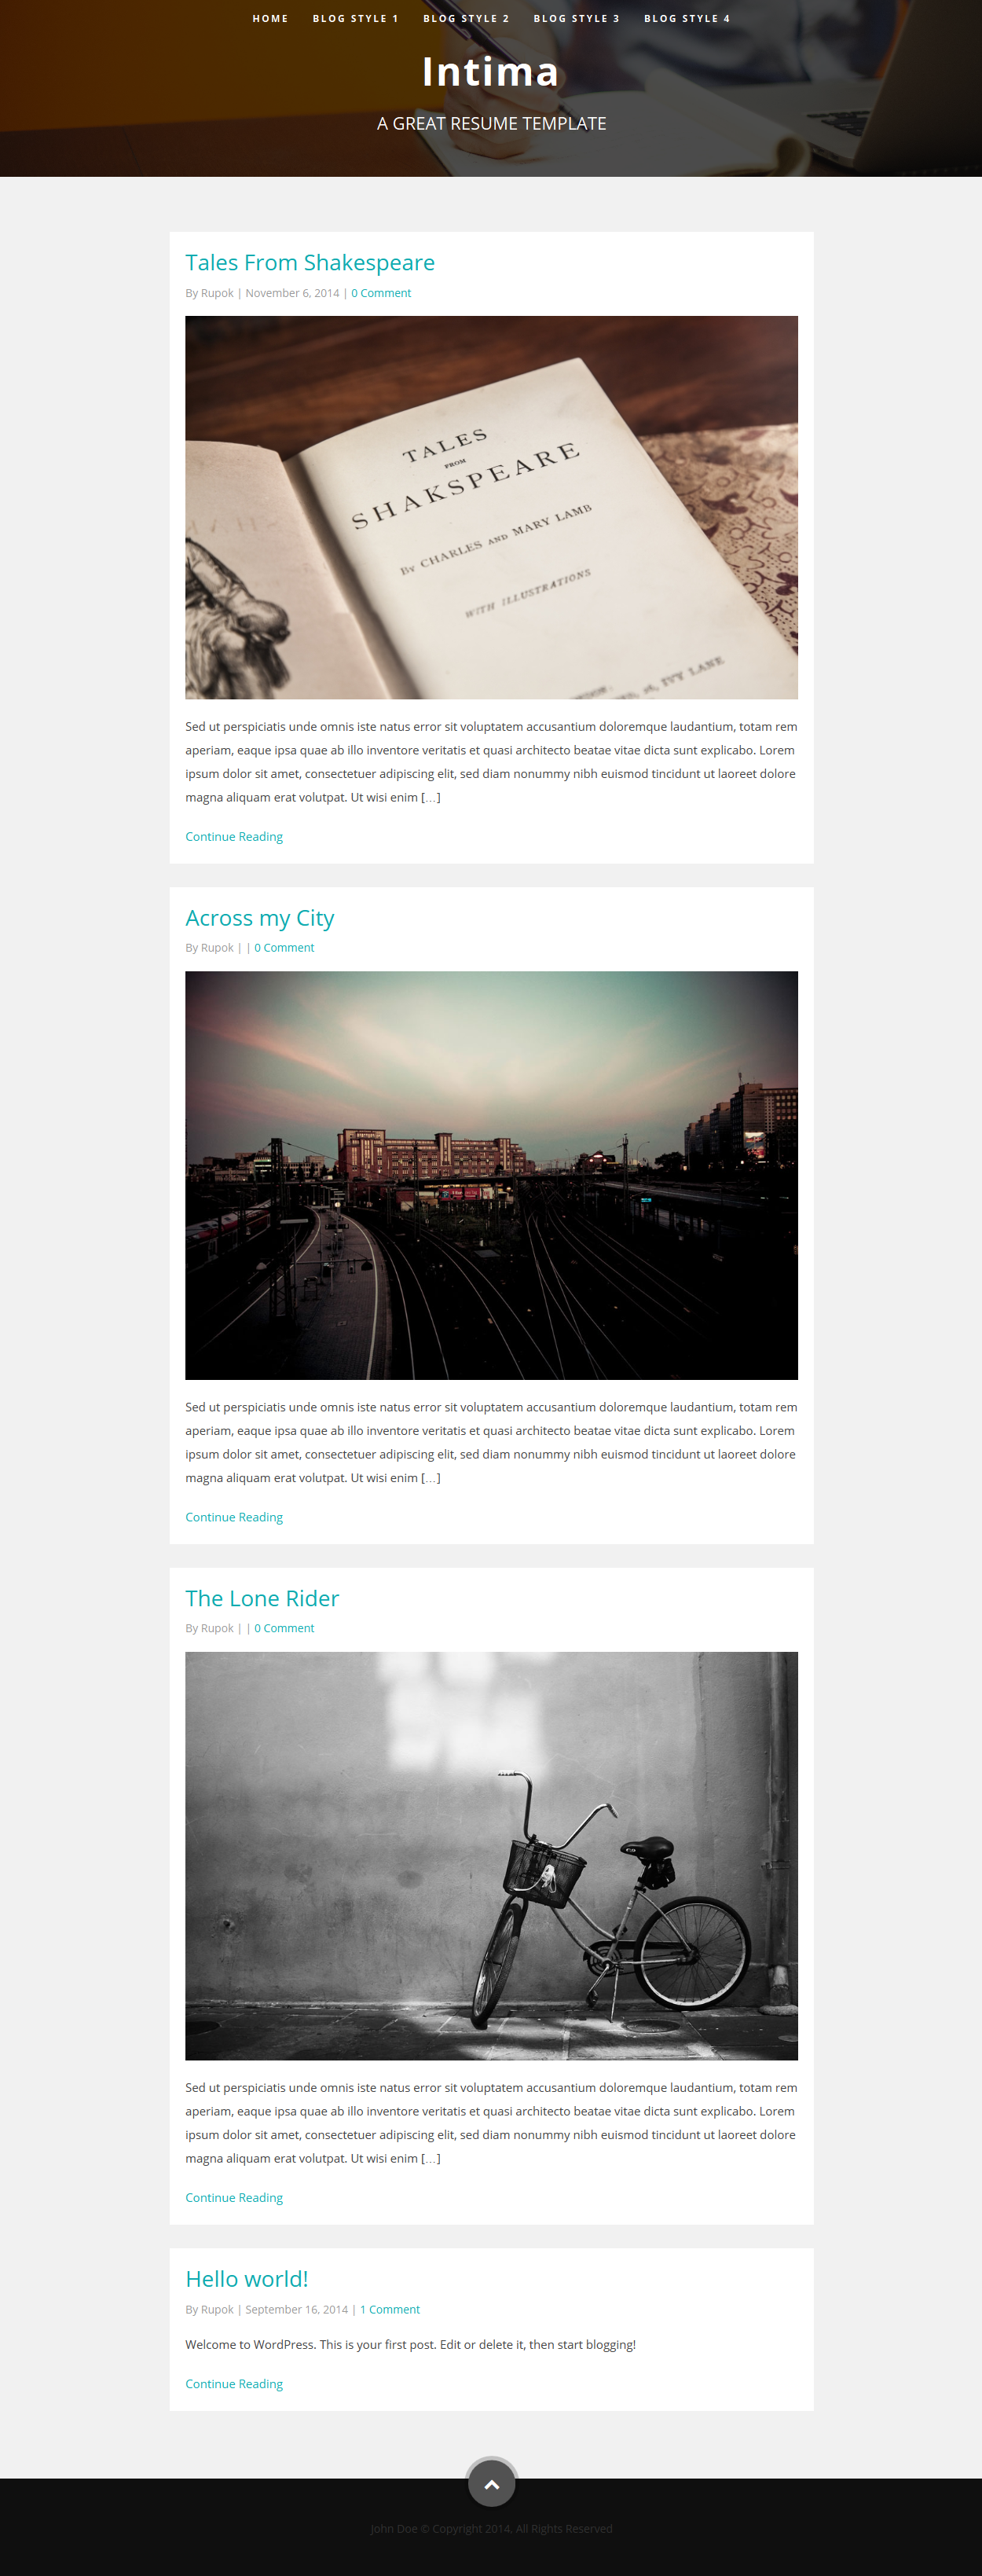 Intima Resume Portfolio Wordpress Theme By Bdinfosys Themeforest